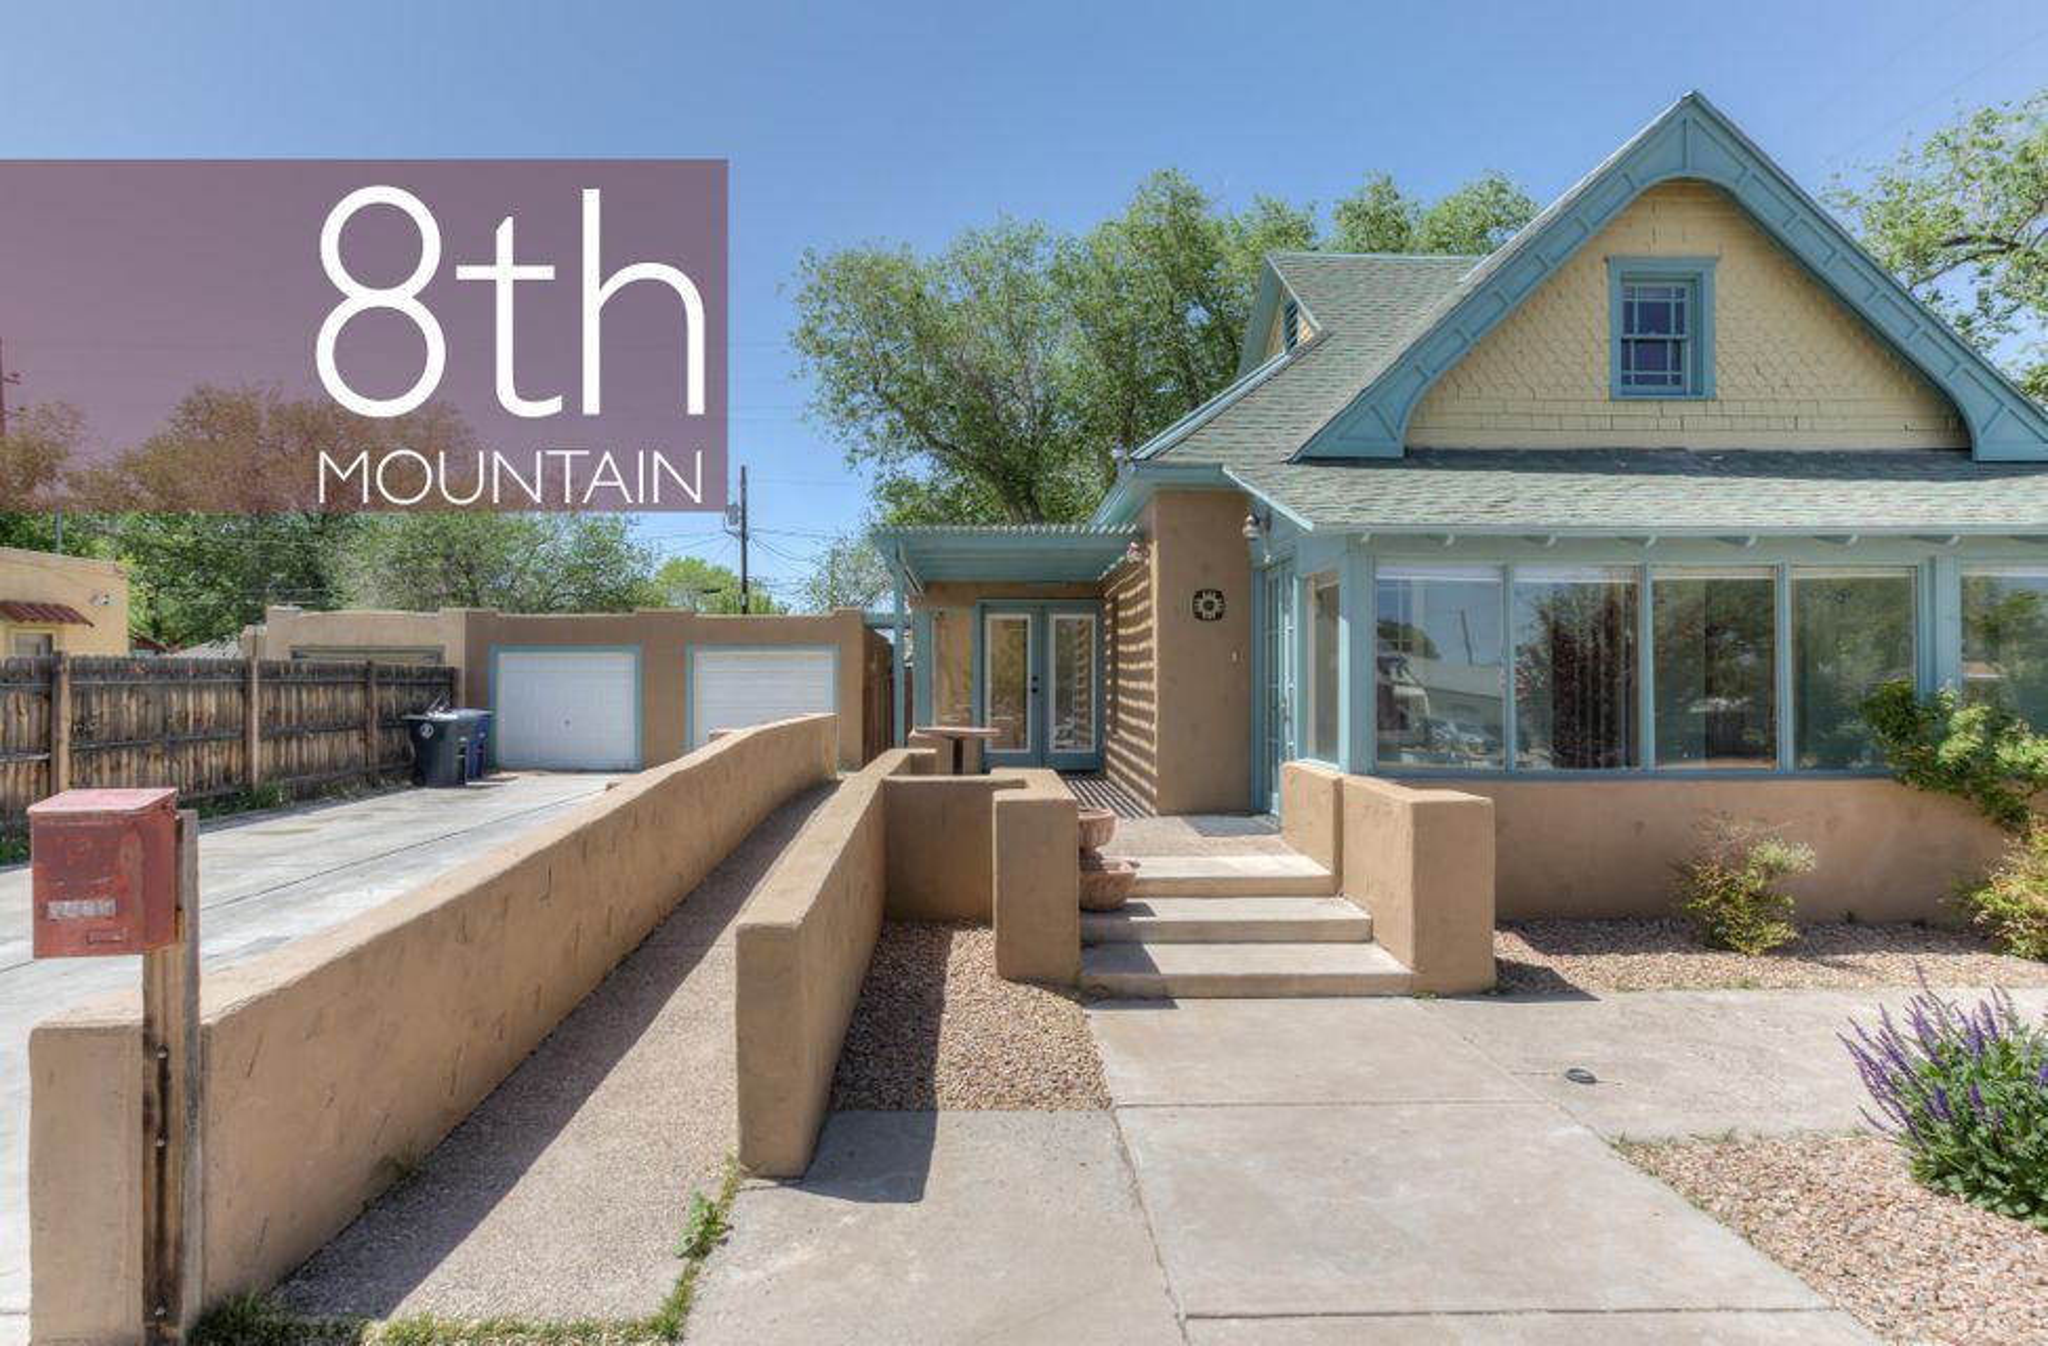 1123 8Th Street NW, Albuquerque, NM 87102